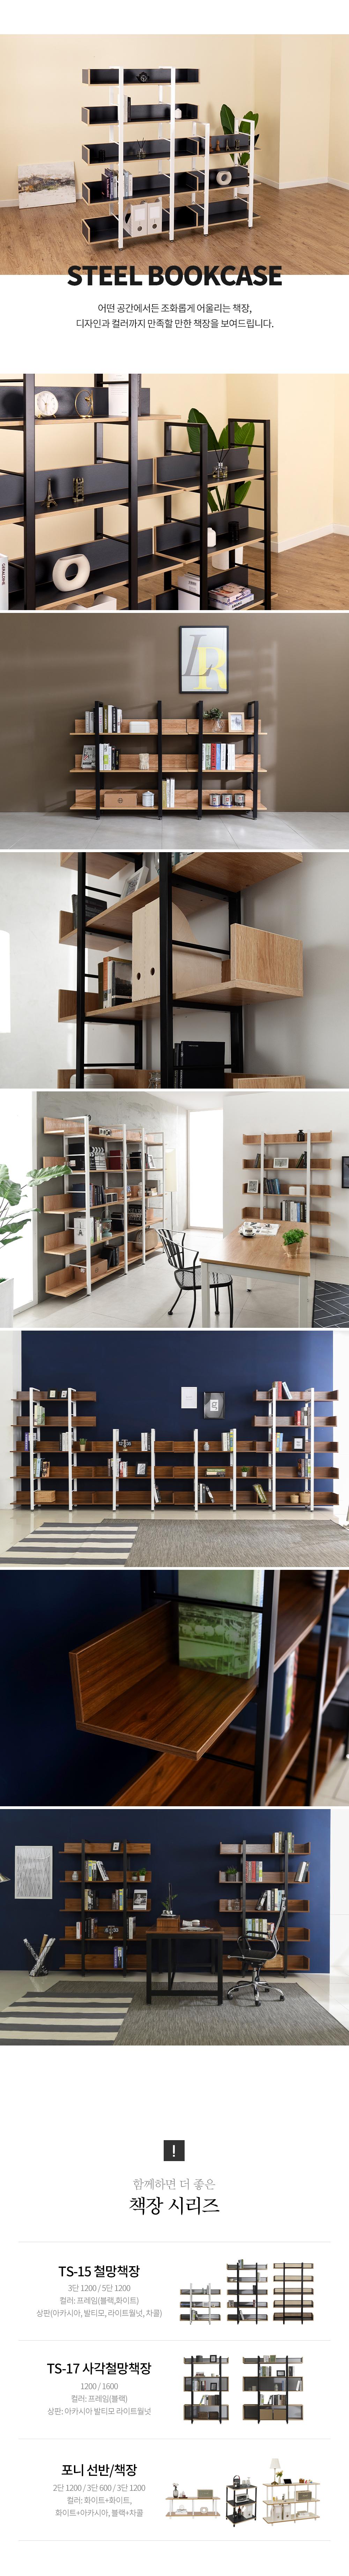 TS-15 5단 1200 책장 책꽂이 수납선반 학생책장 - 티에스퍼니처, 175,400원, 책상/의자, 일반 책상